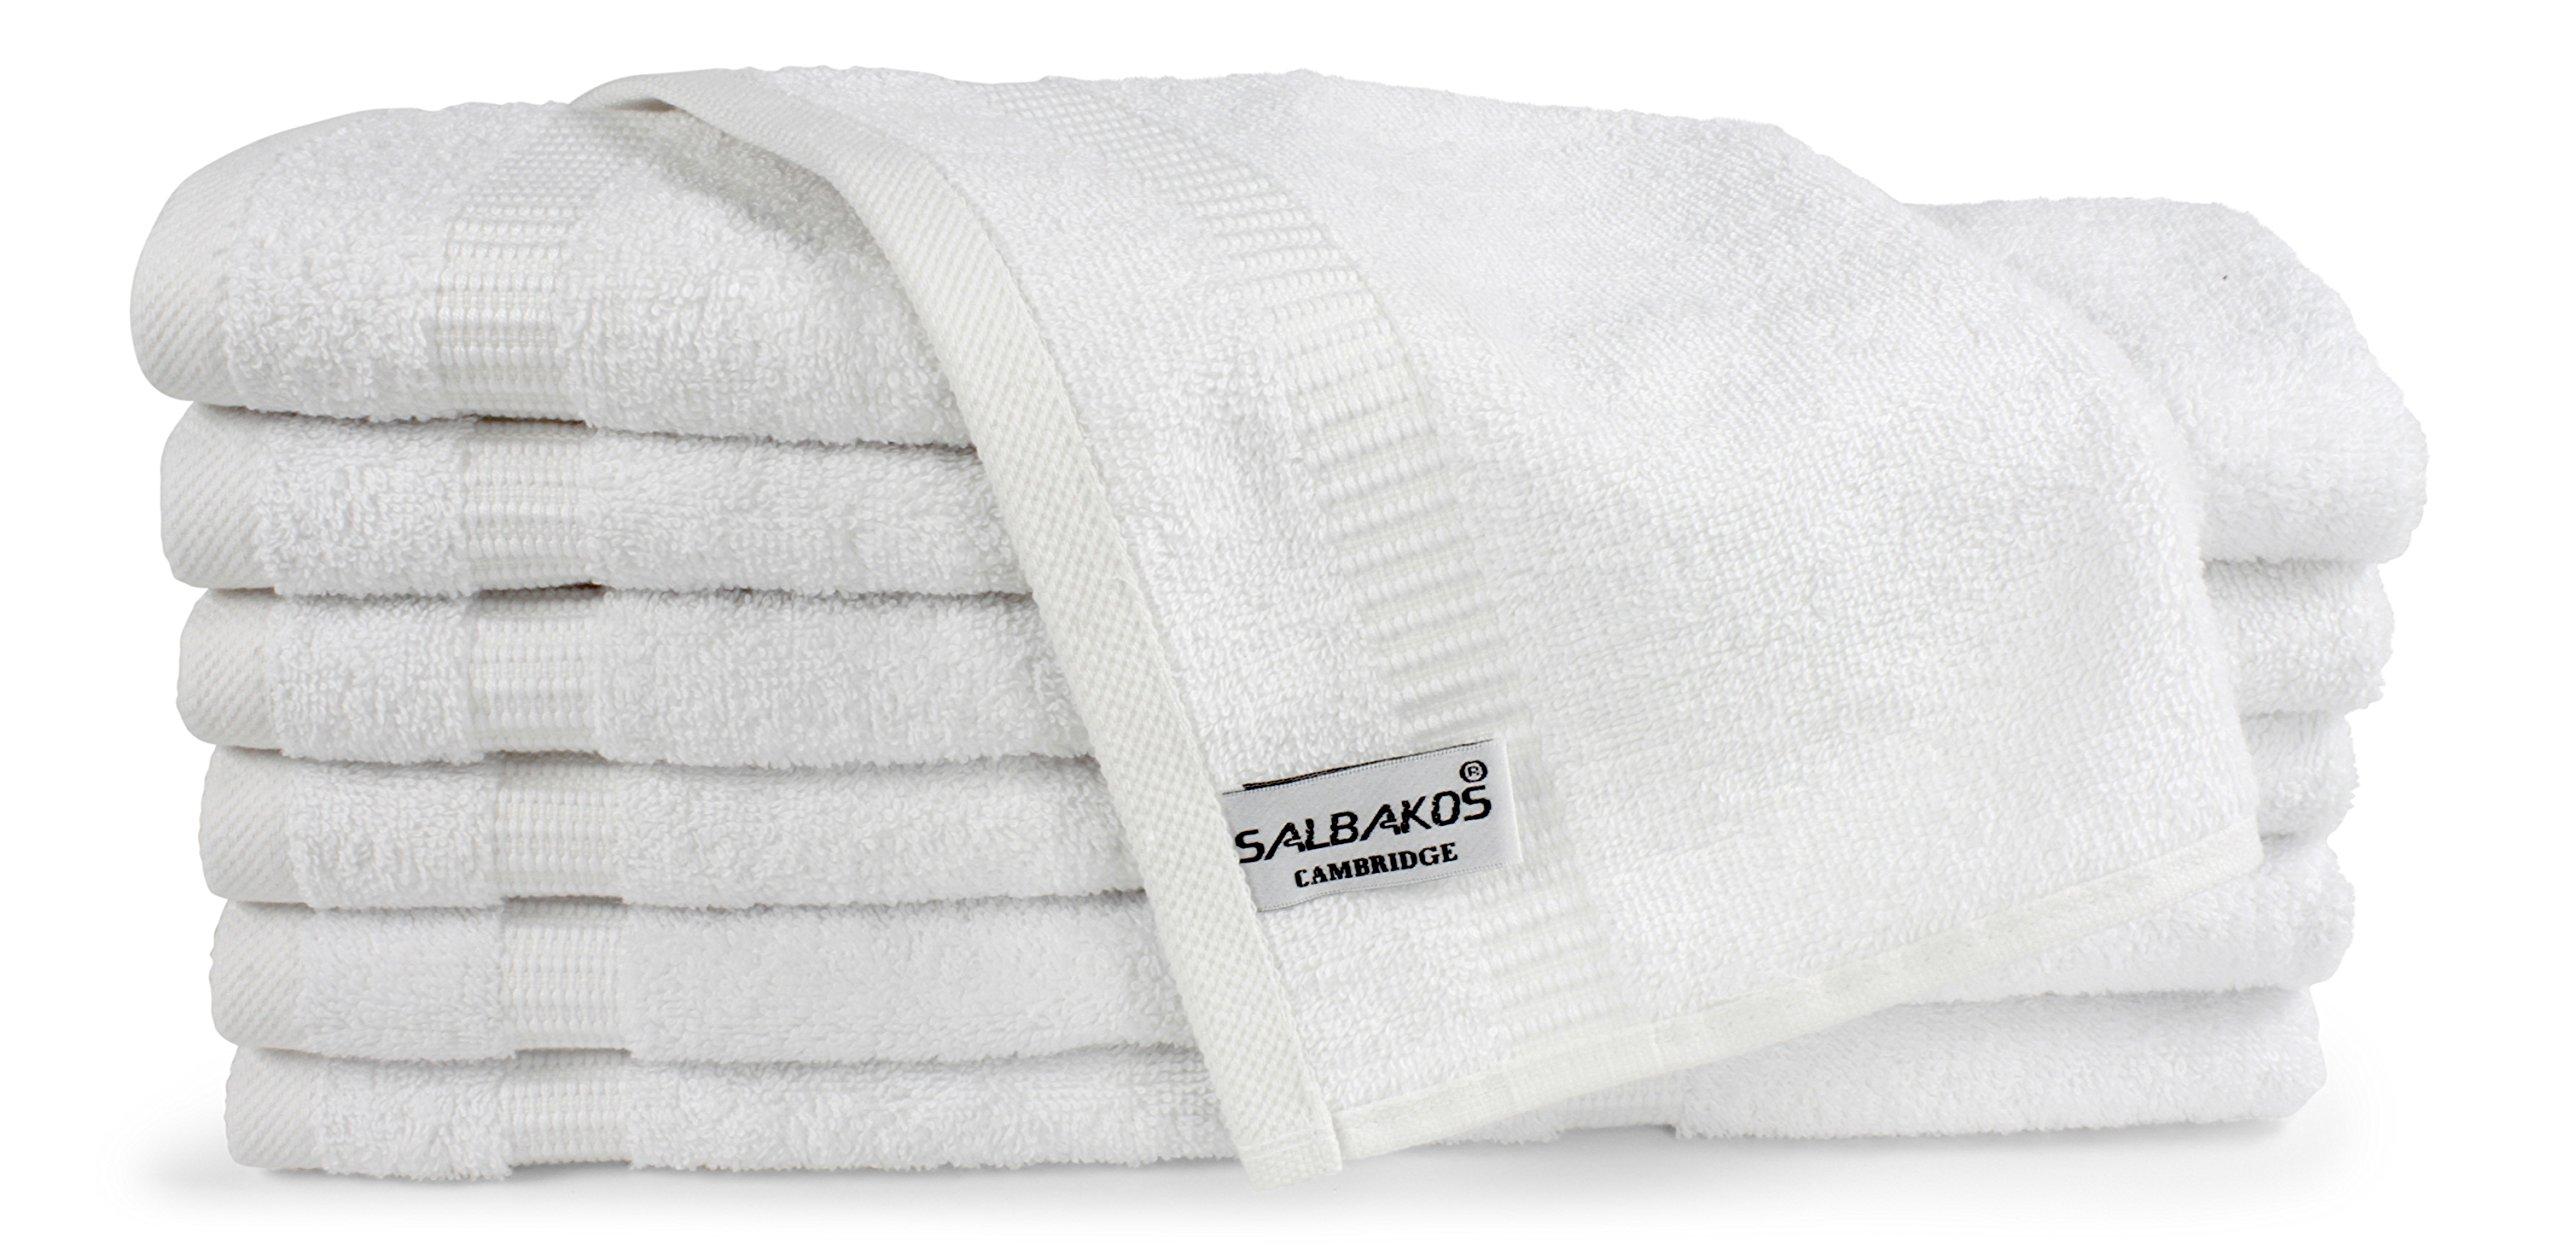 SALBAKOS Luxury Hotel & Spa Turkish Cotton 12-Piece Eco-Friendly Washcloth Set Bath, 13 x 13 Inch, White